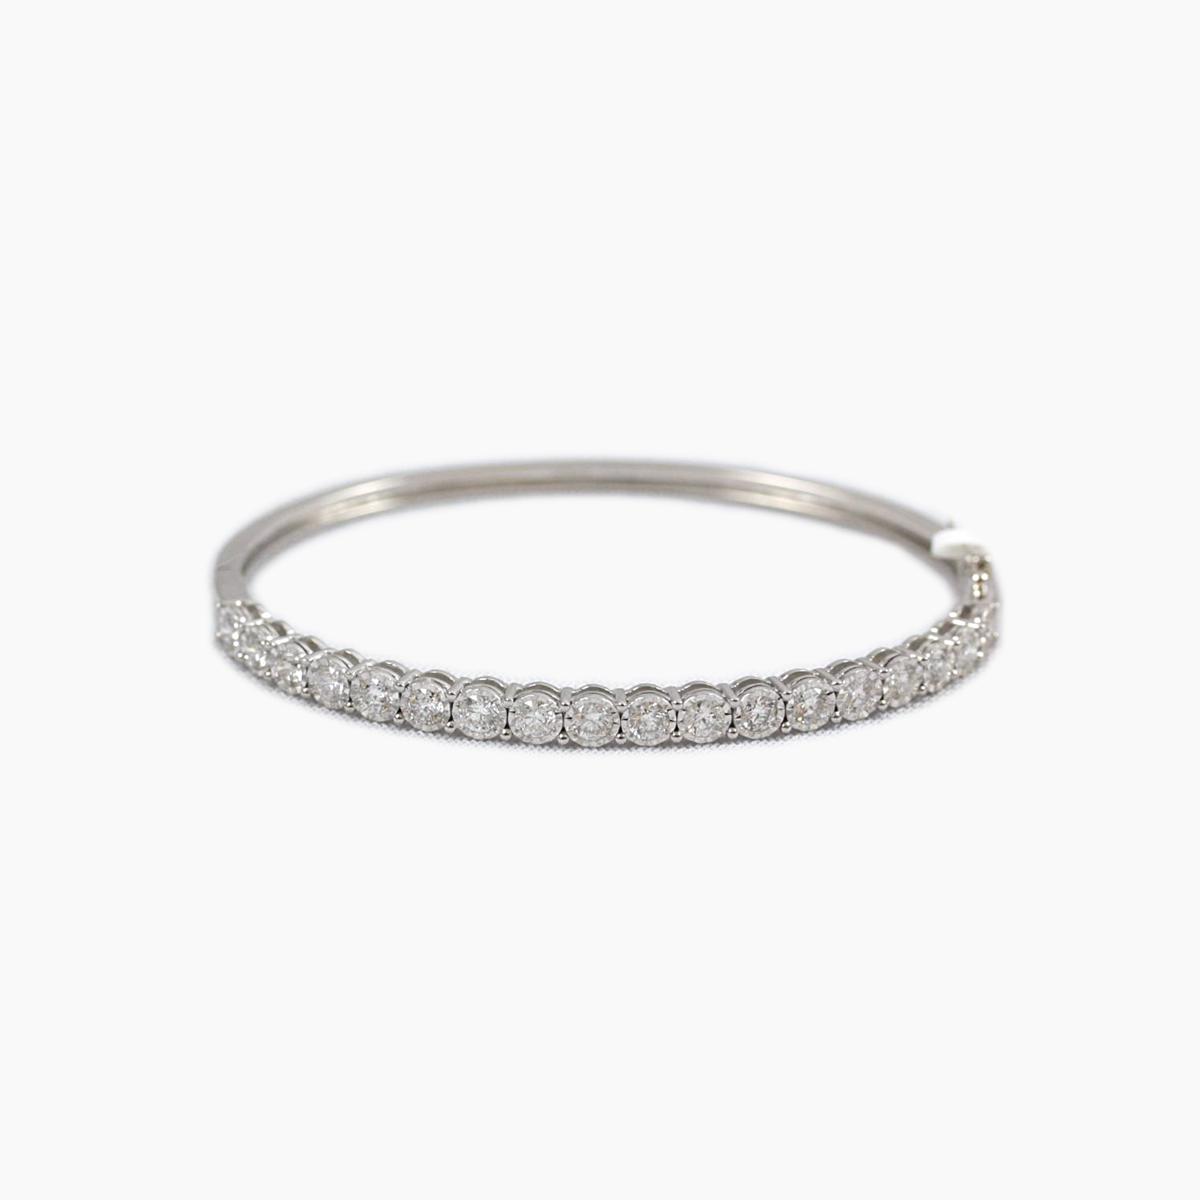 Paramount Gems 14 Karat White Gold Hinged Diamond Bangle Bracelet